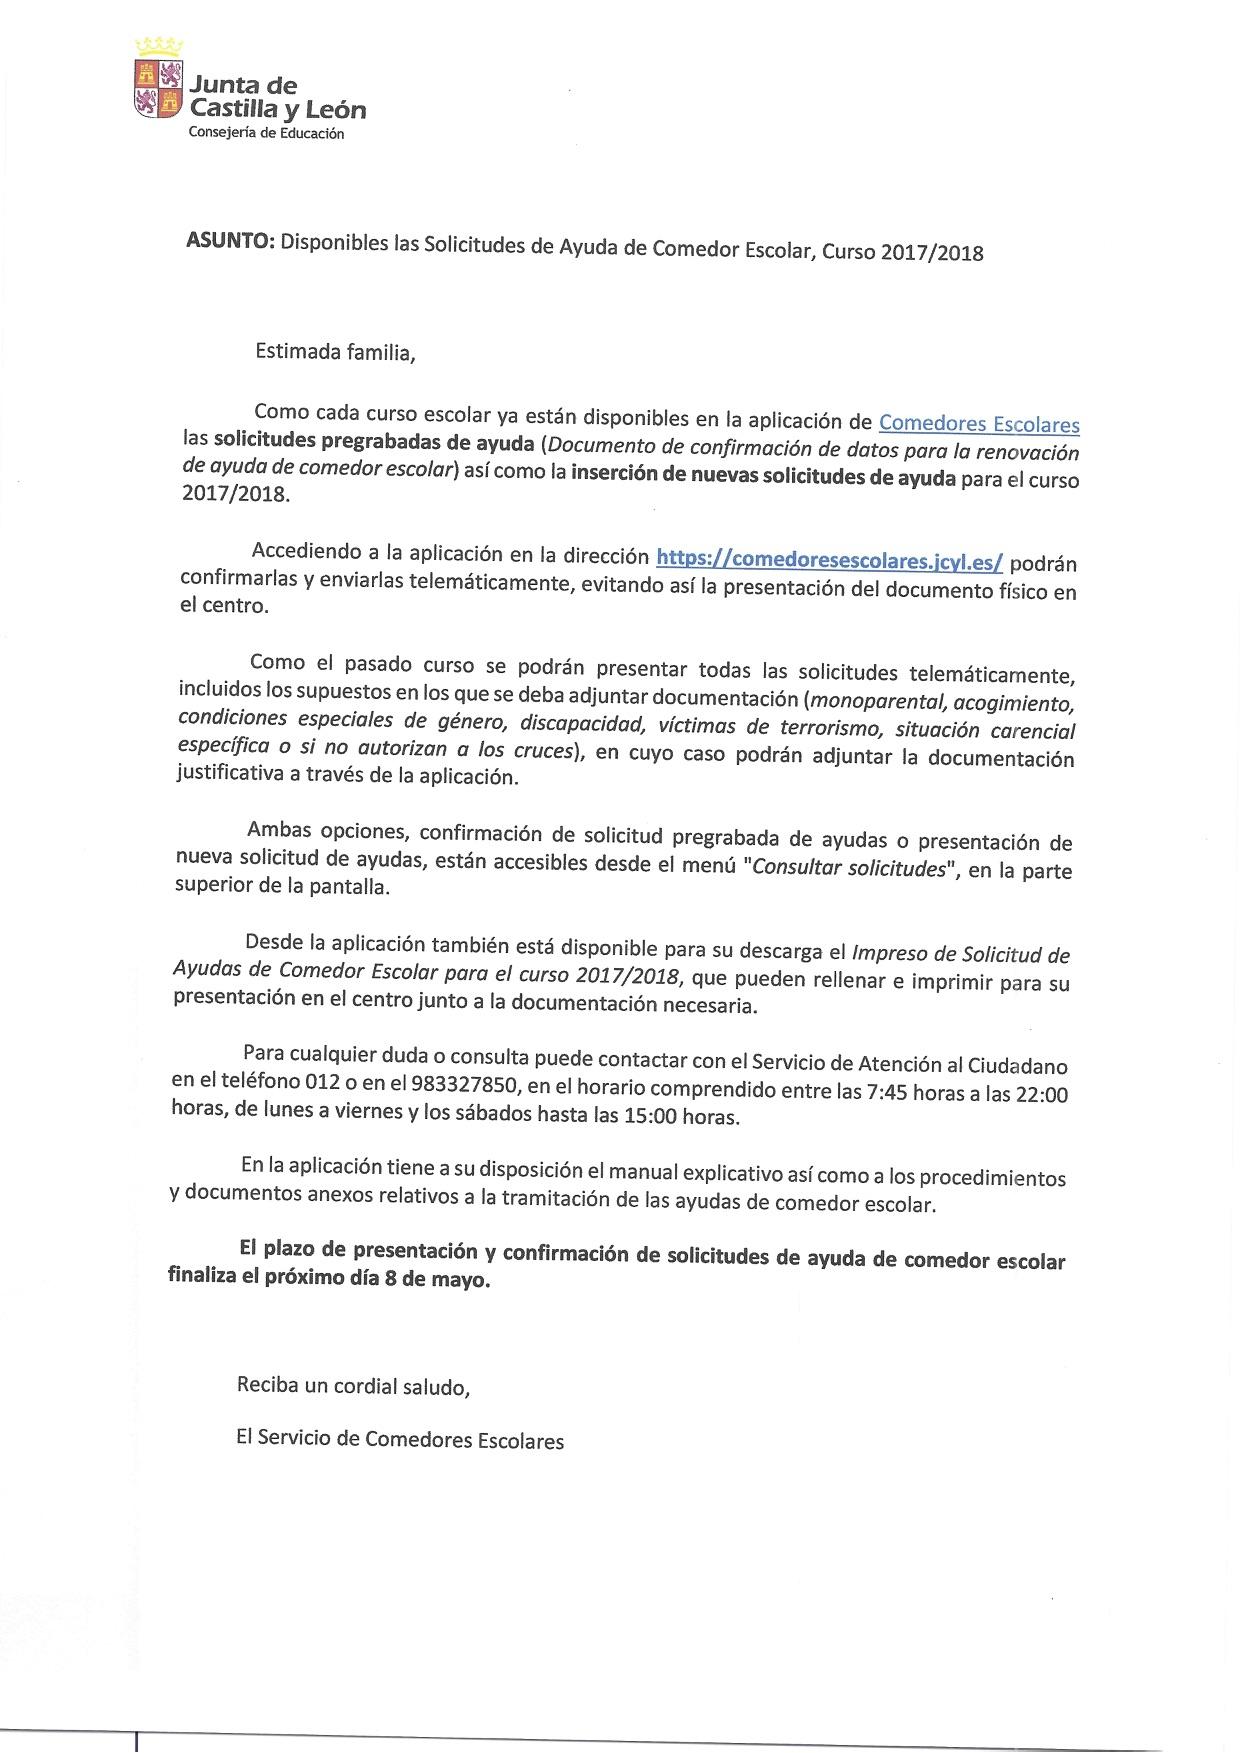 CEIP Pedro Aragoneses Alonso